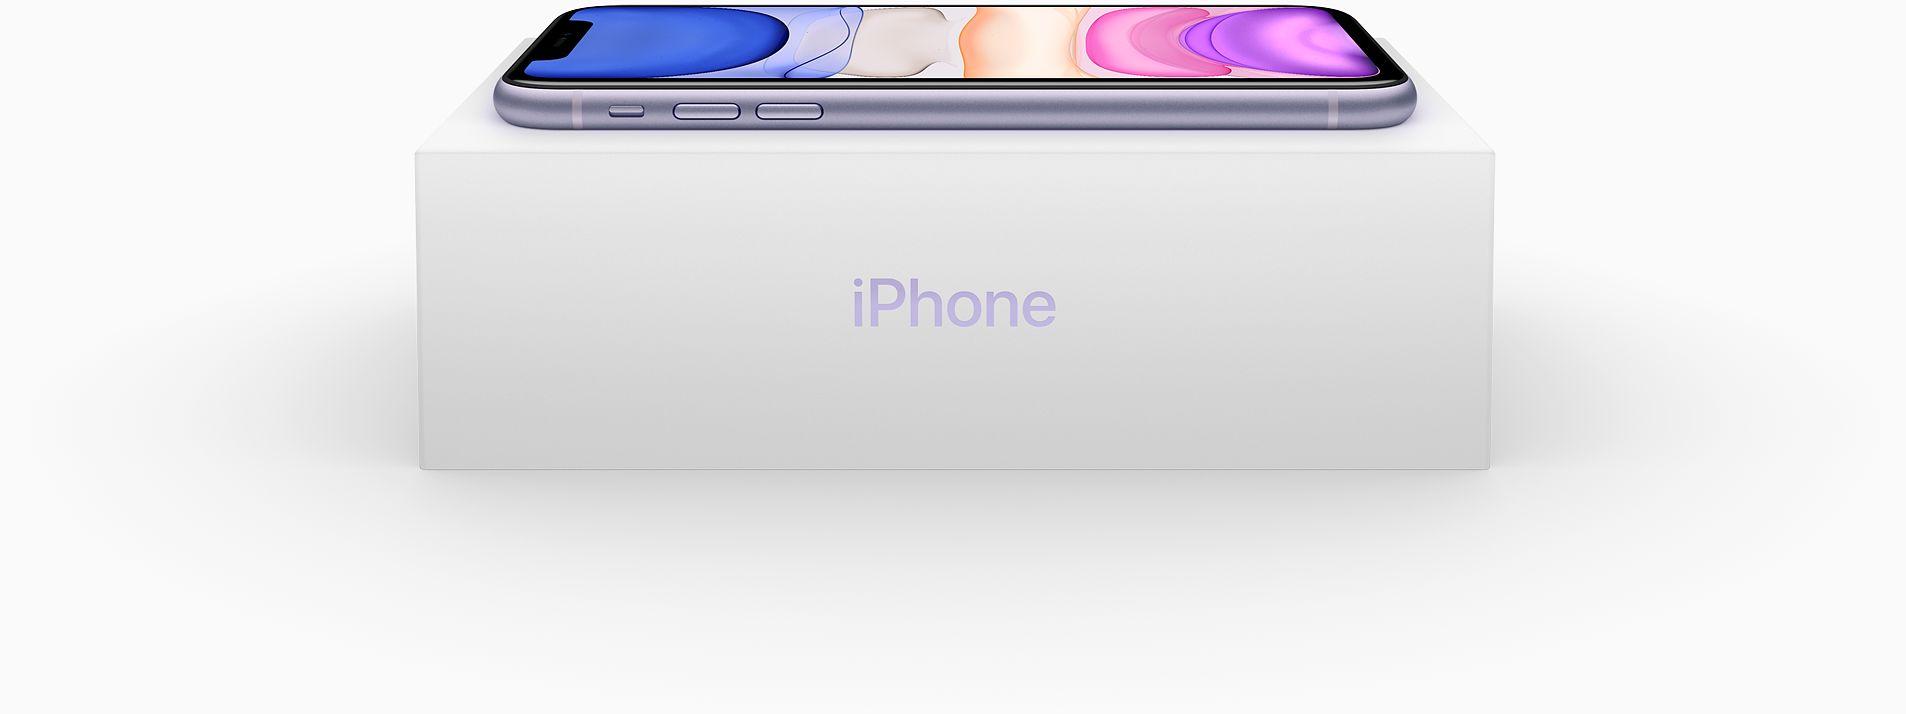 入手 iPhone 11 or 12?iPhone 年年焕新计划考虑一下